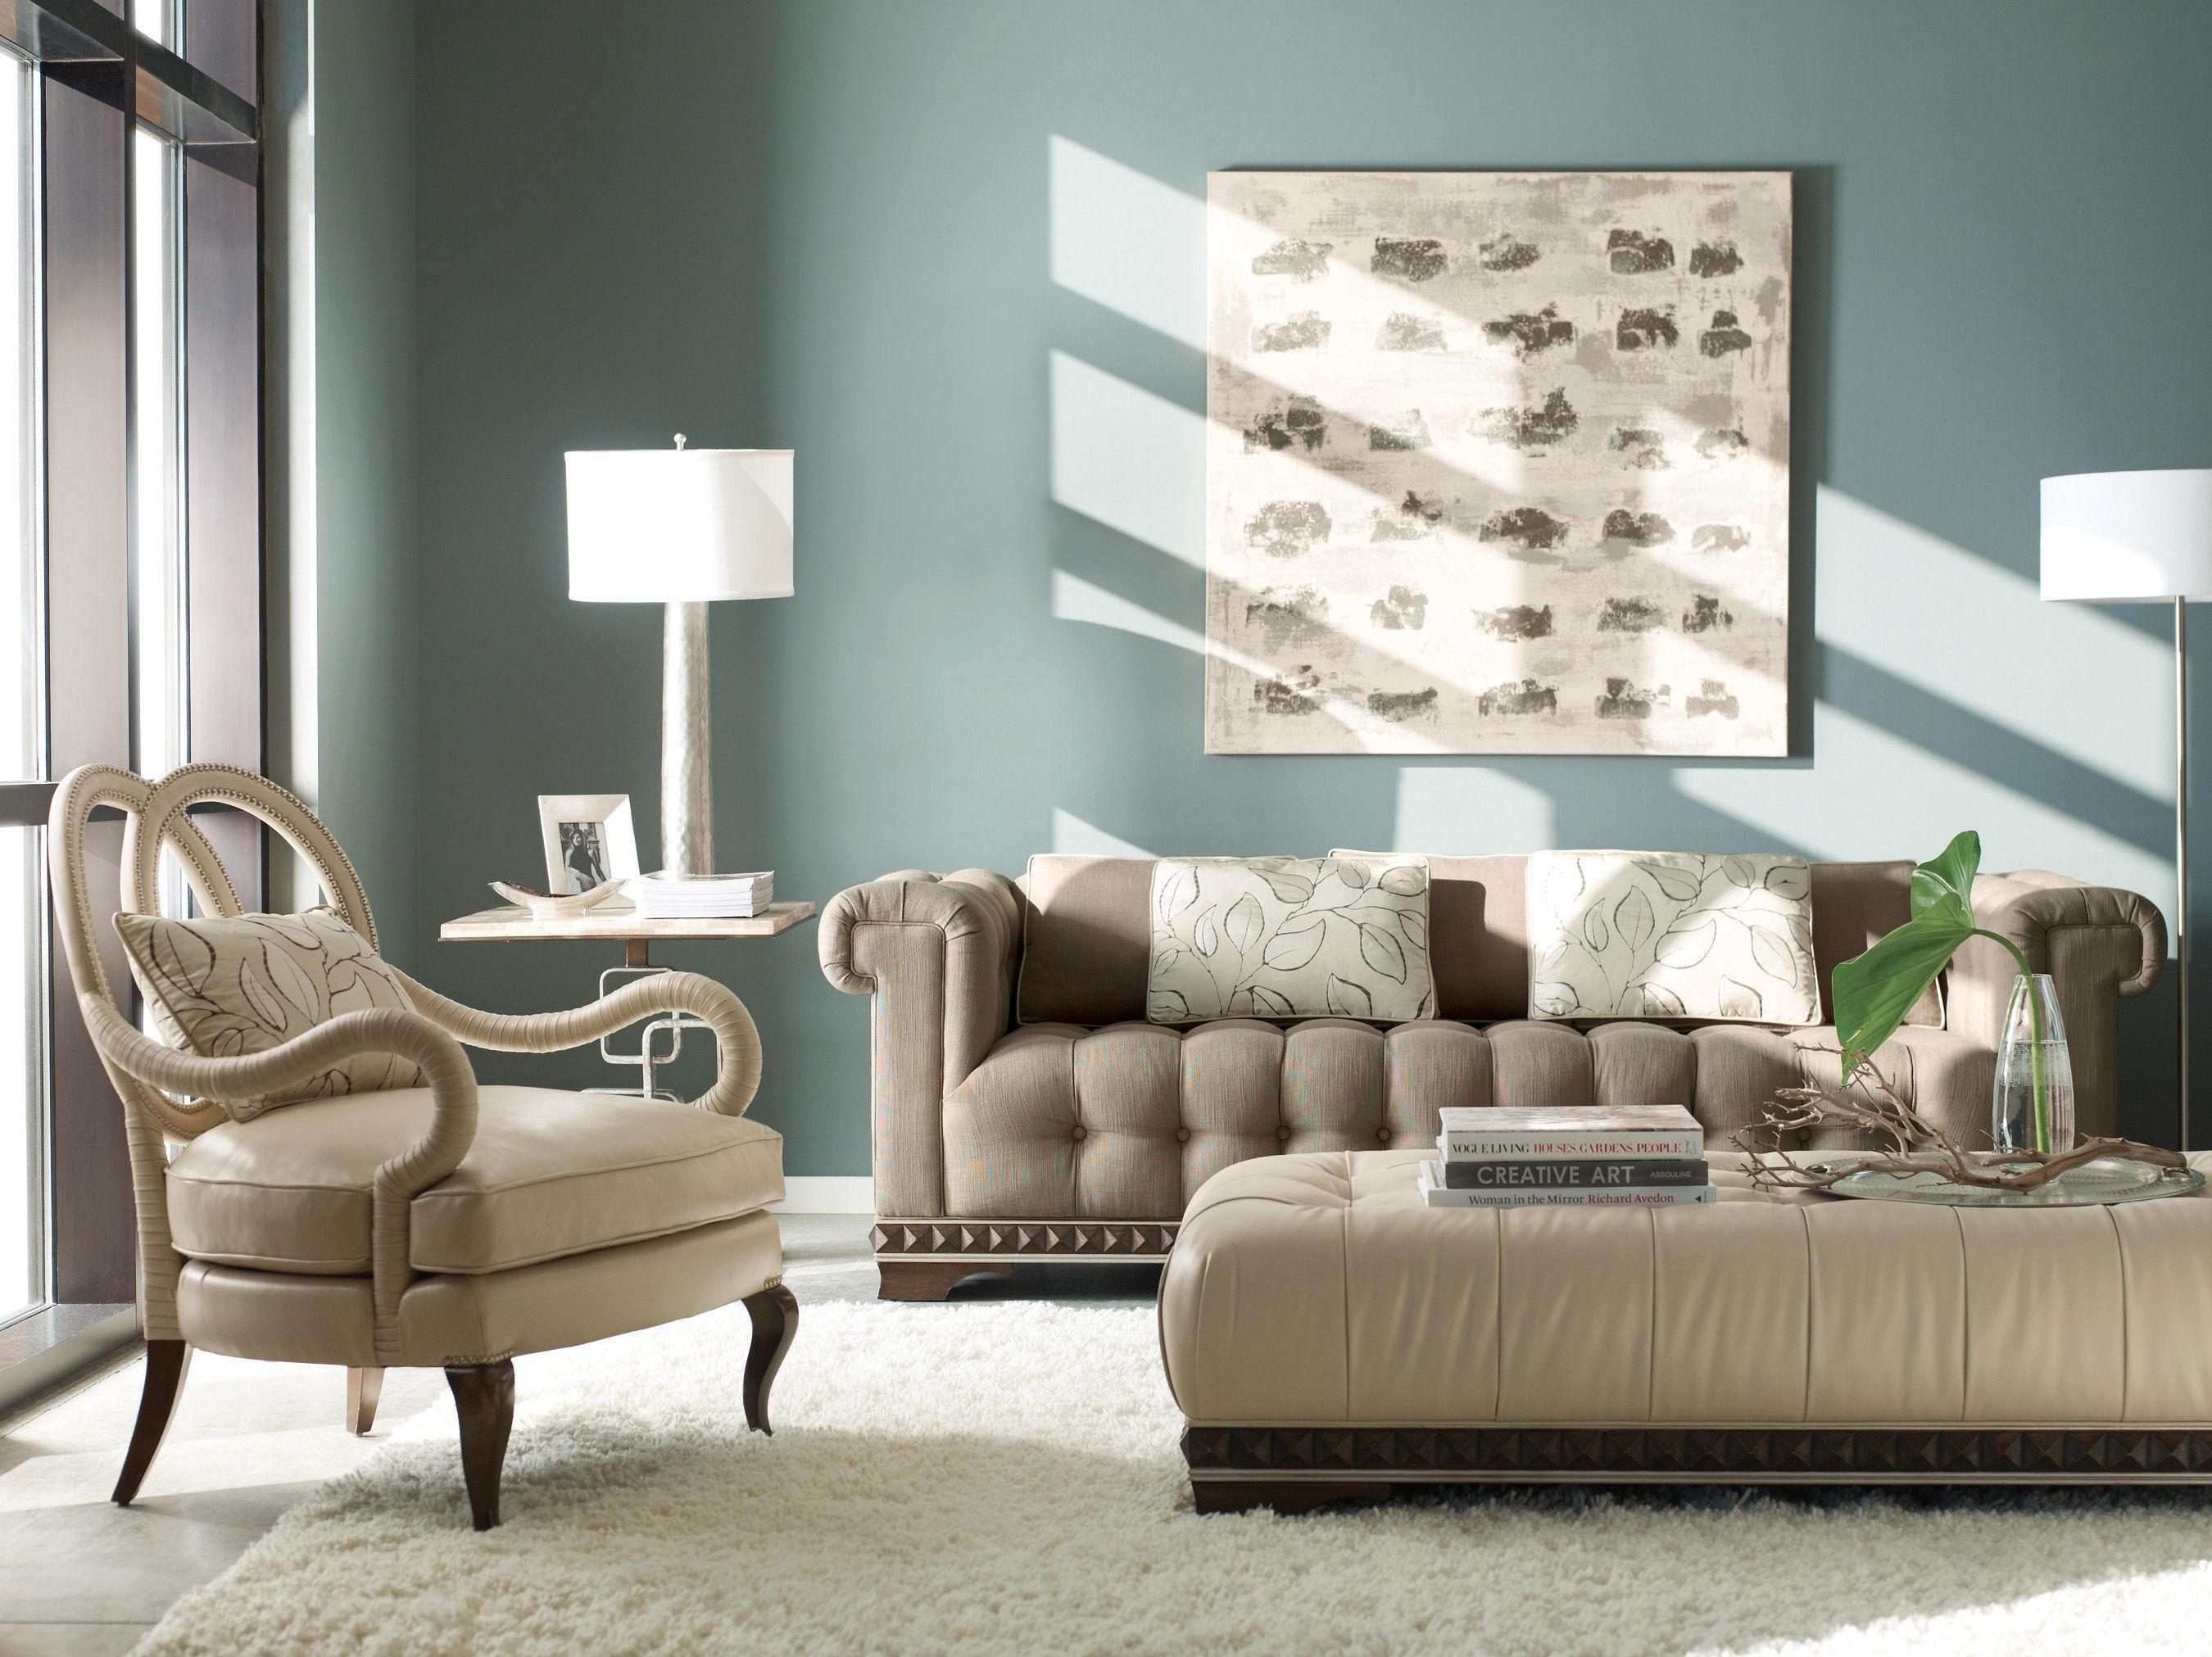 Camel Leather Sofa Decorating Ideas | Tehranmix Decoration Regarding Camel Color Sofas (Image 9 of 20)